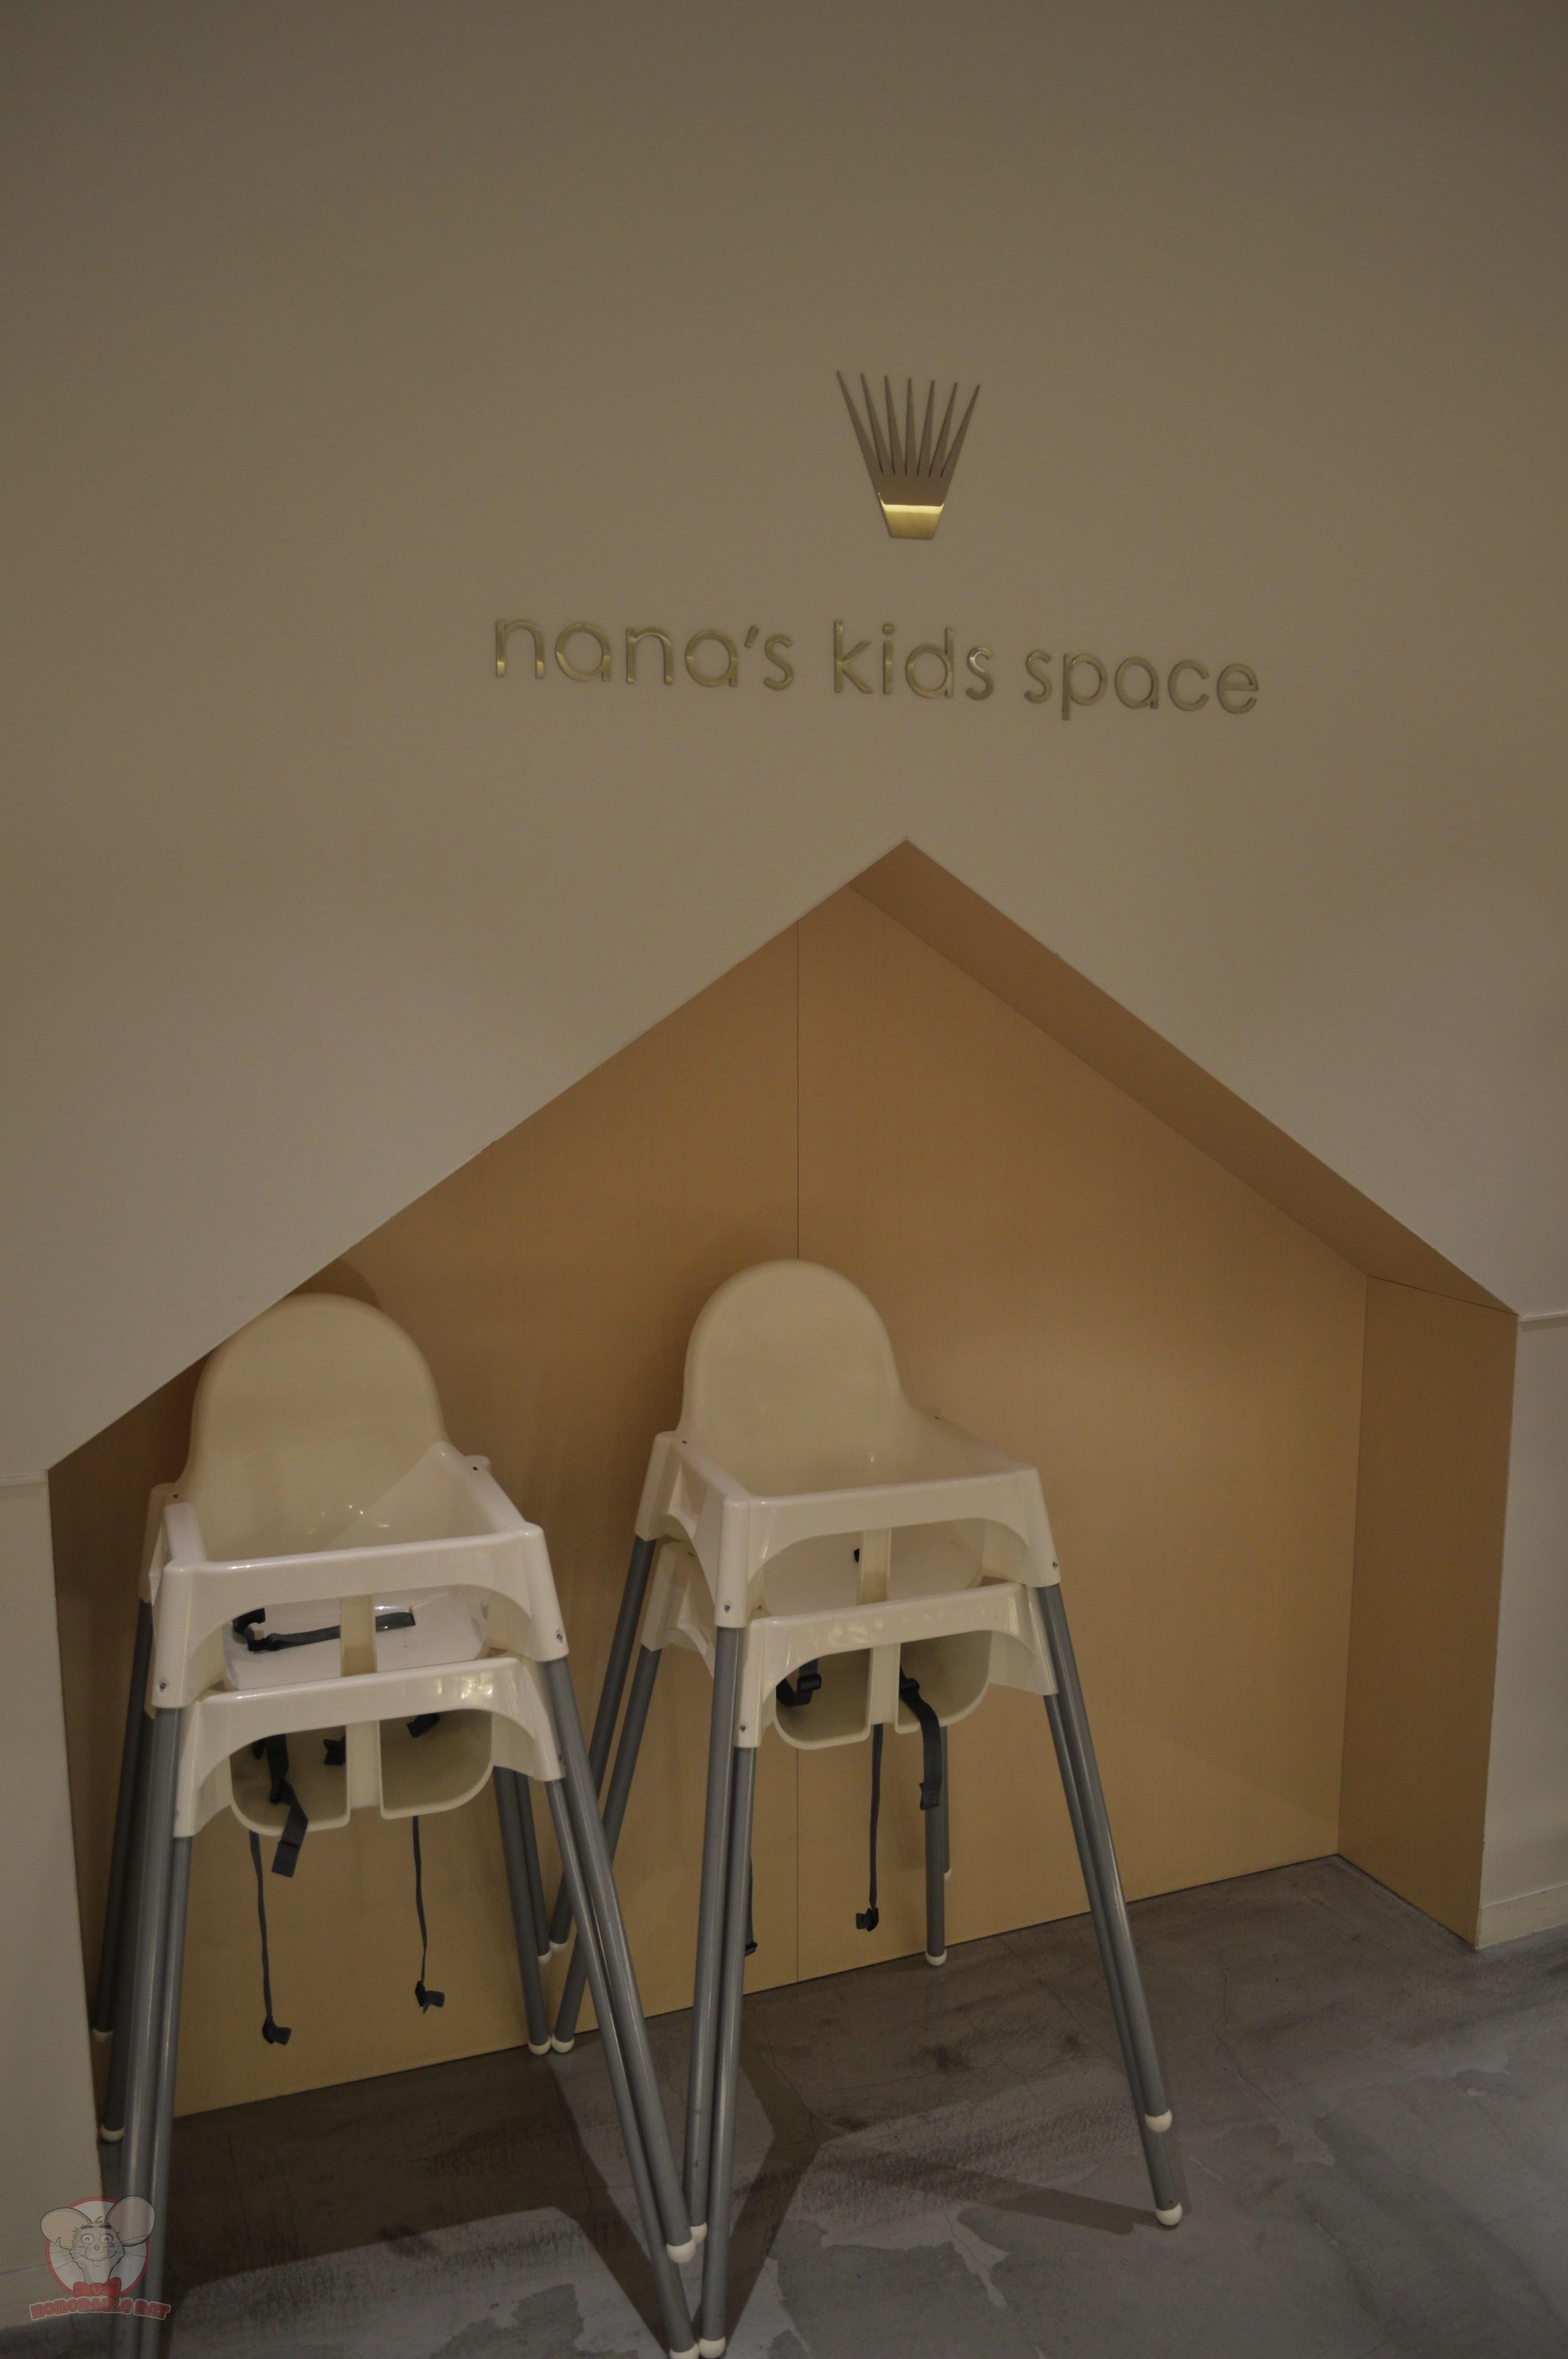 Nana's Kids Space